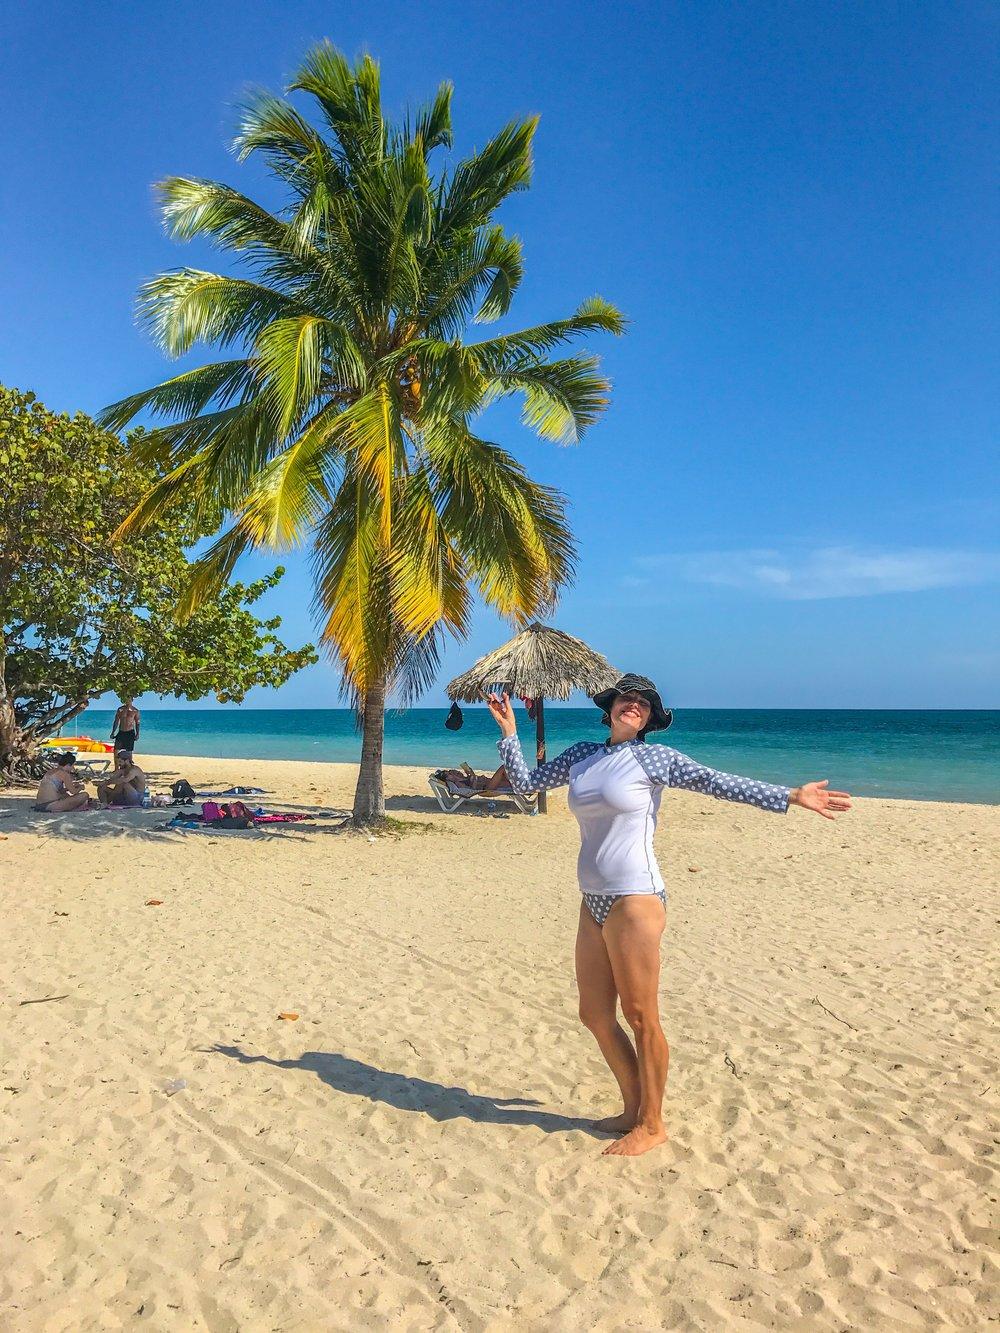 Me at the beach in Trinidad, Cuba